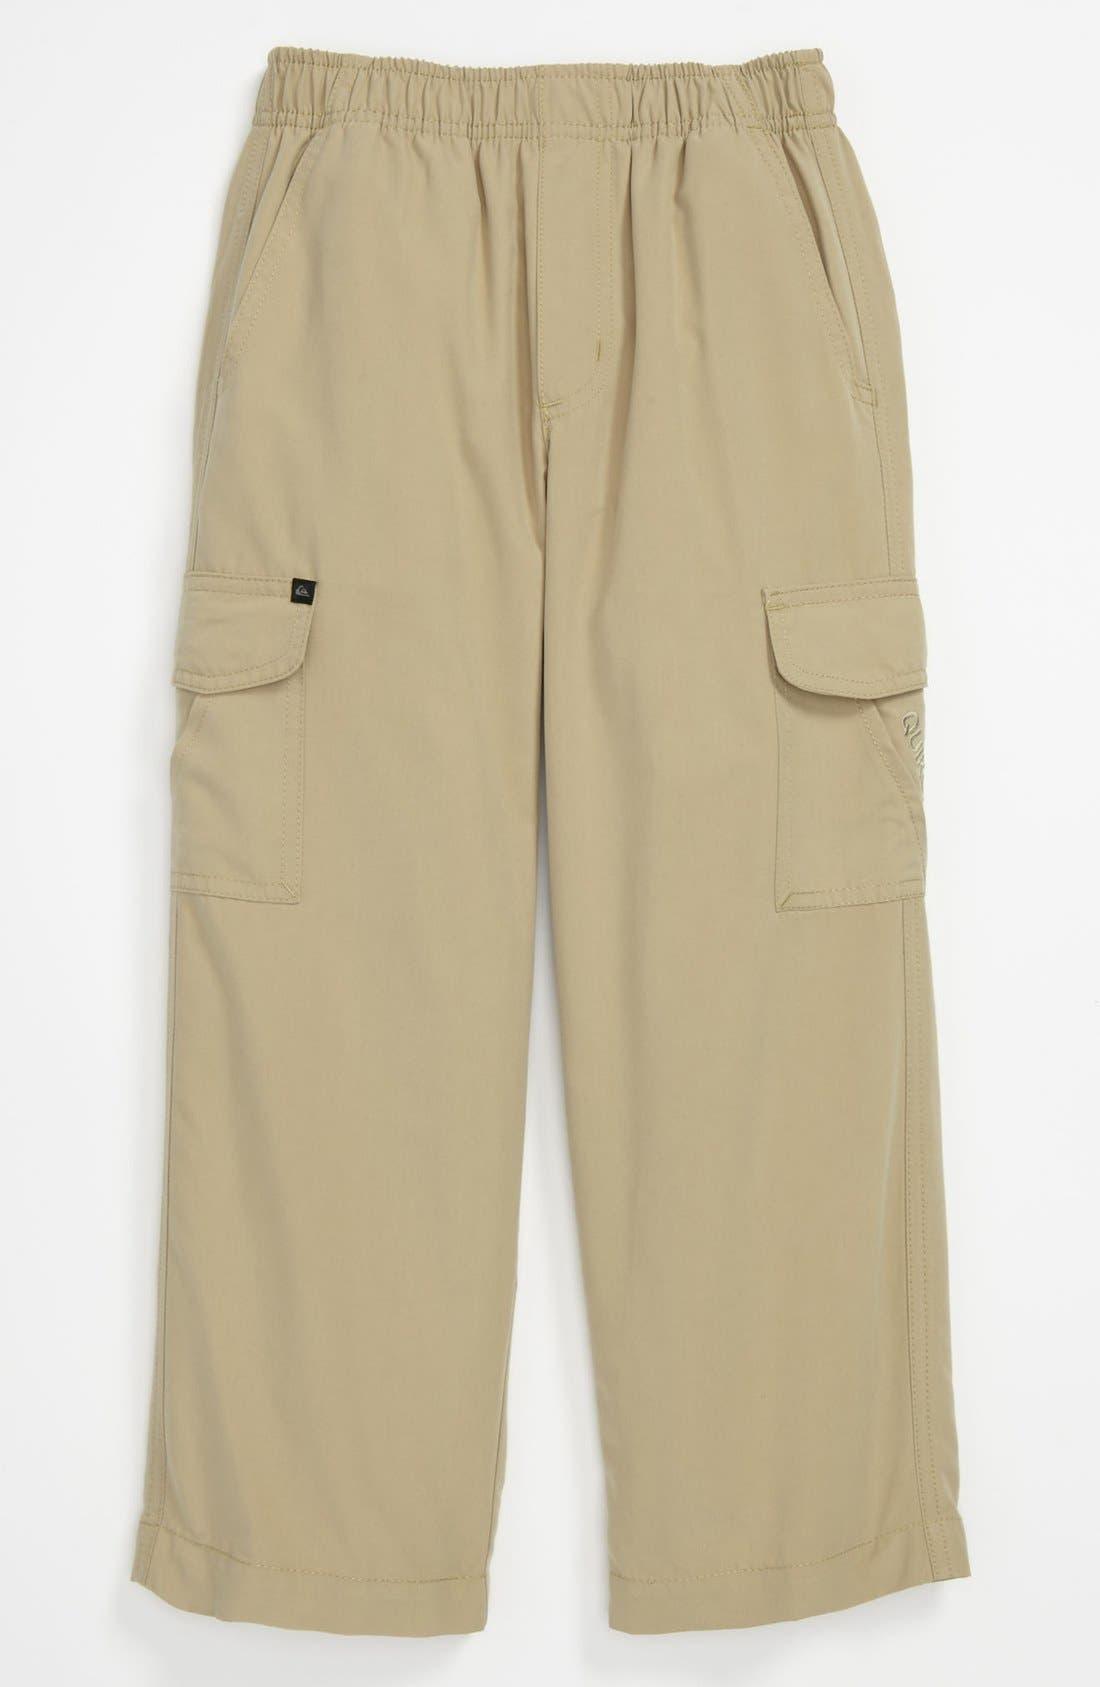 Alternate Image 1 Selected - Quiksilver 'Kamotion' Pants (Little Boys)